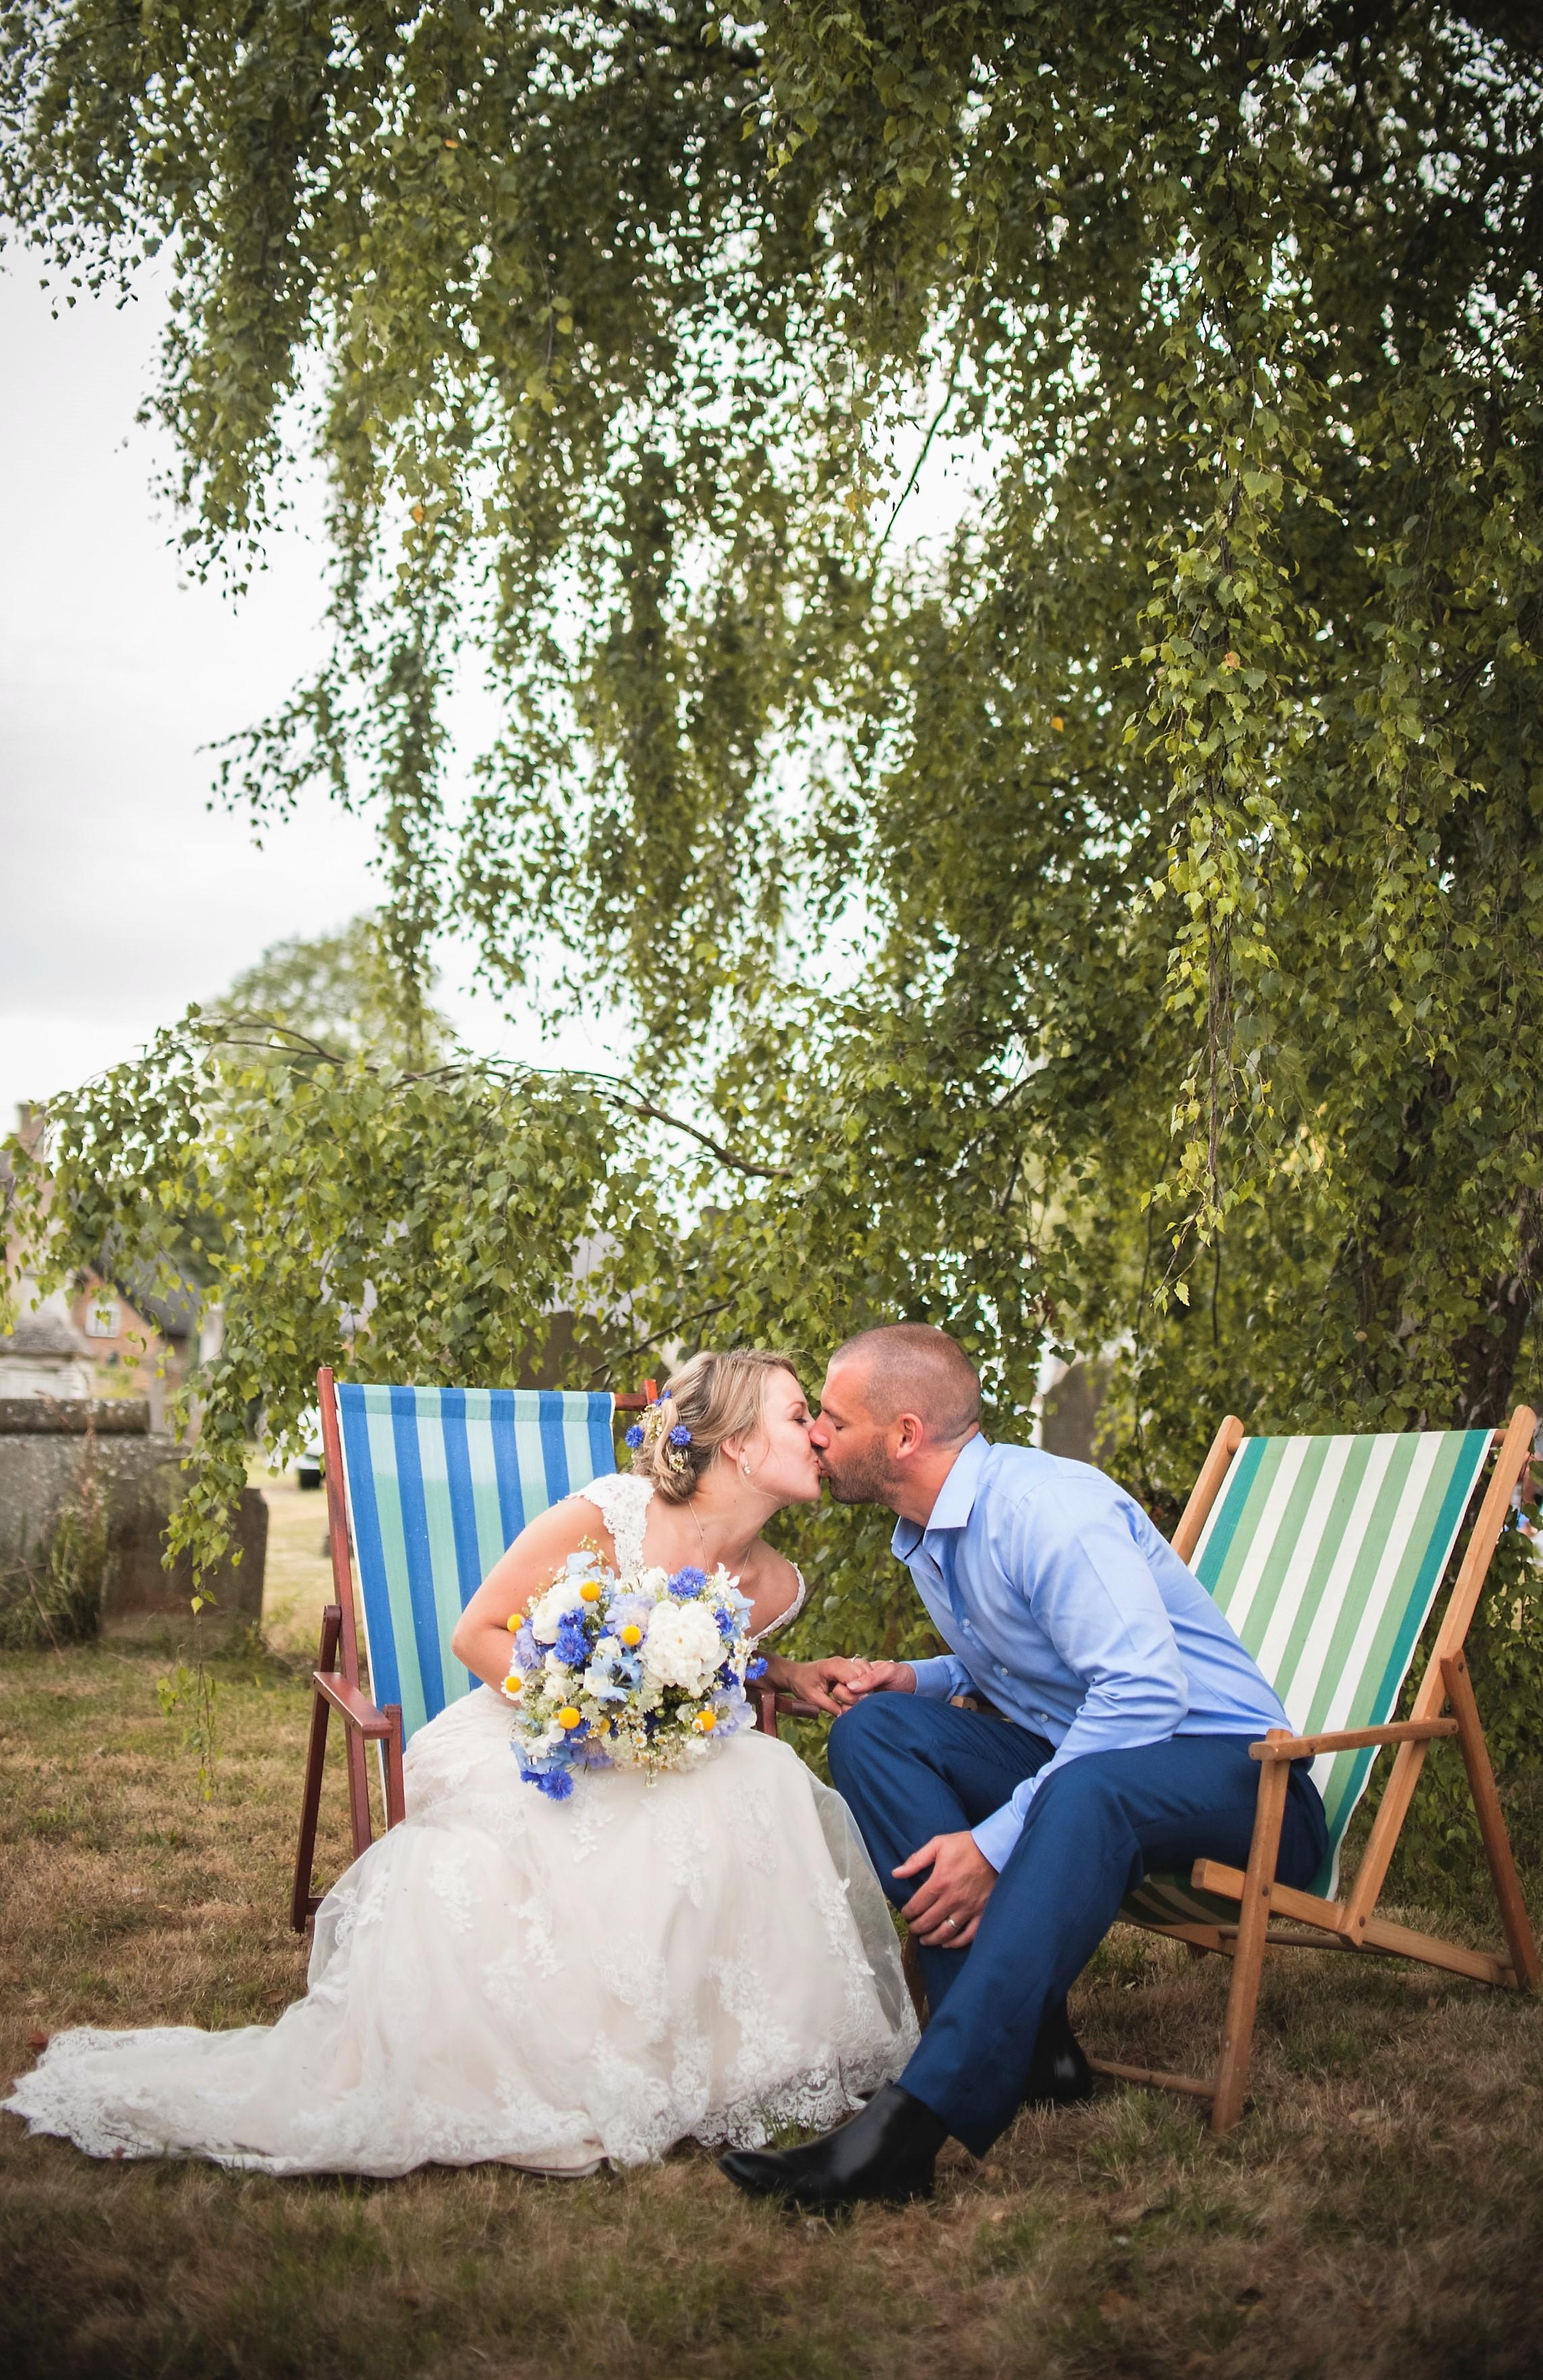 weddings - deckchairs.jpg